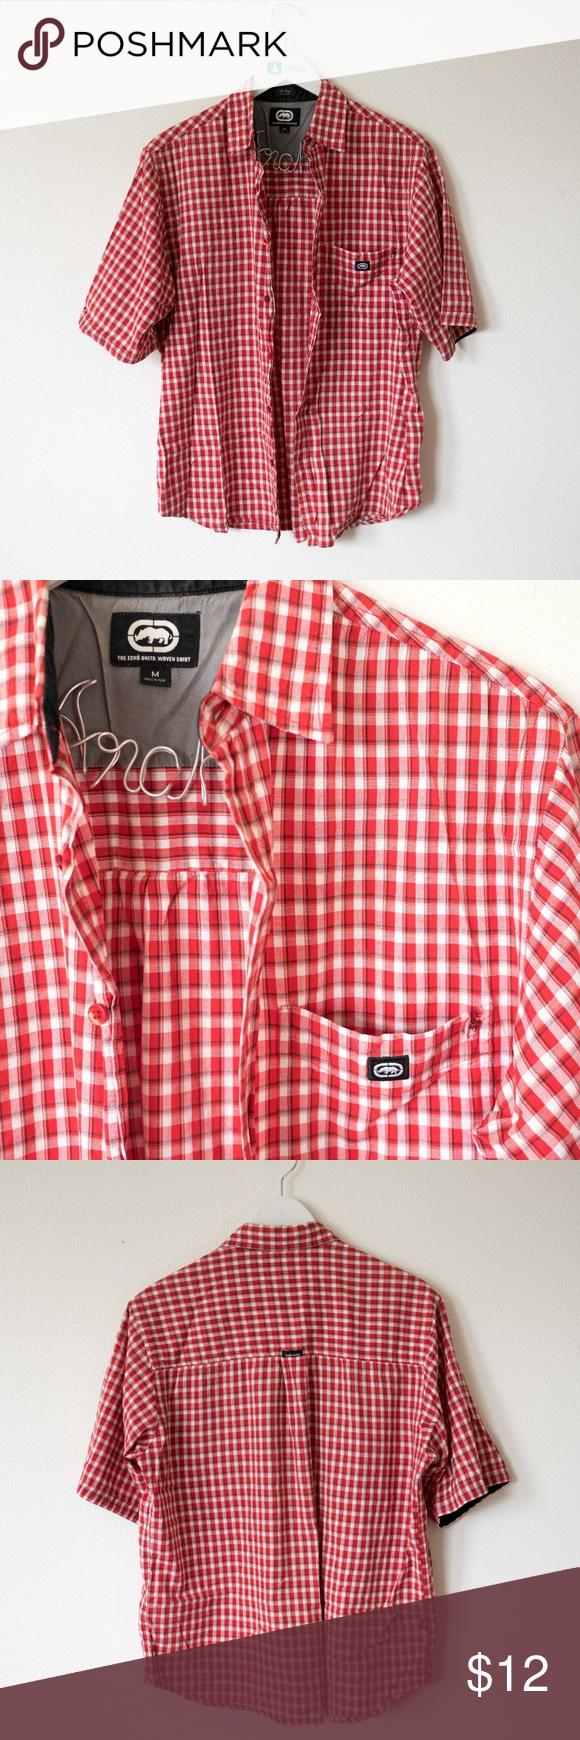 MENS medium ecko unlimited plaid button up shirt  My Posh Closet